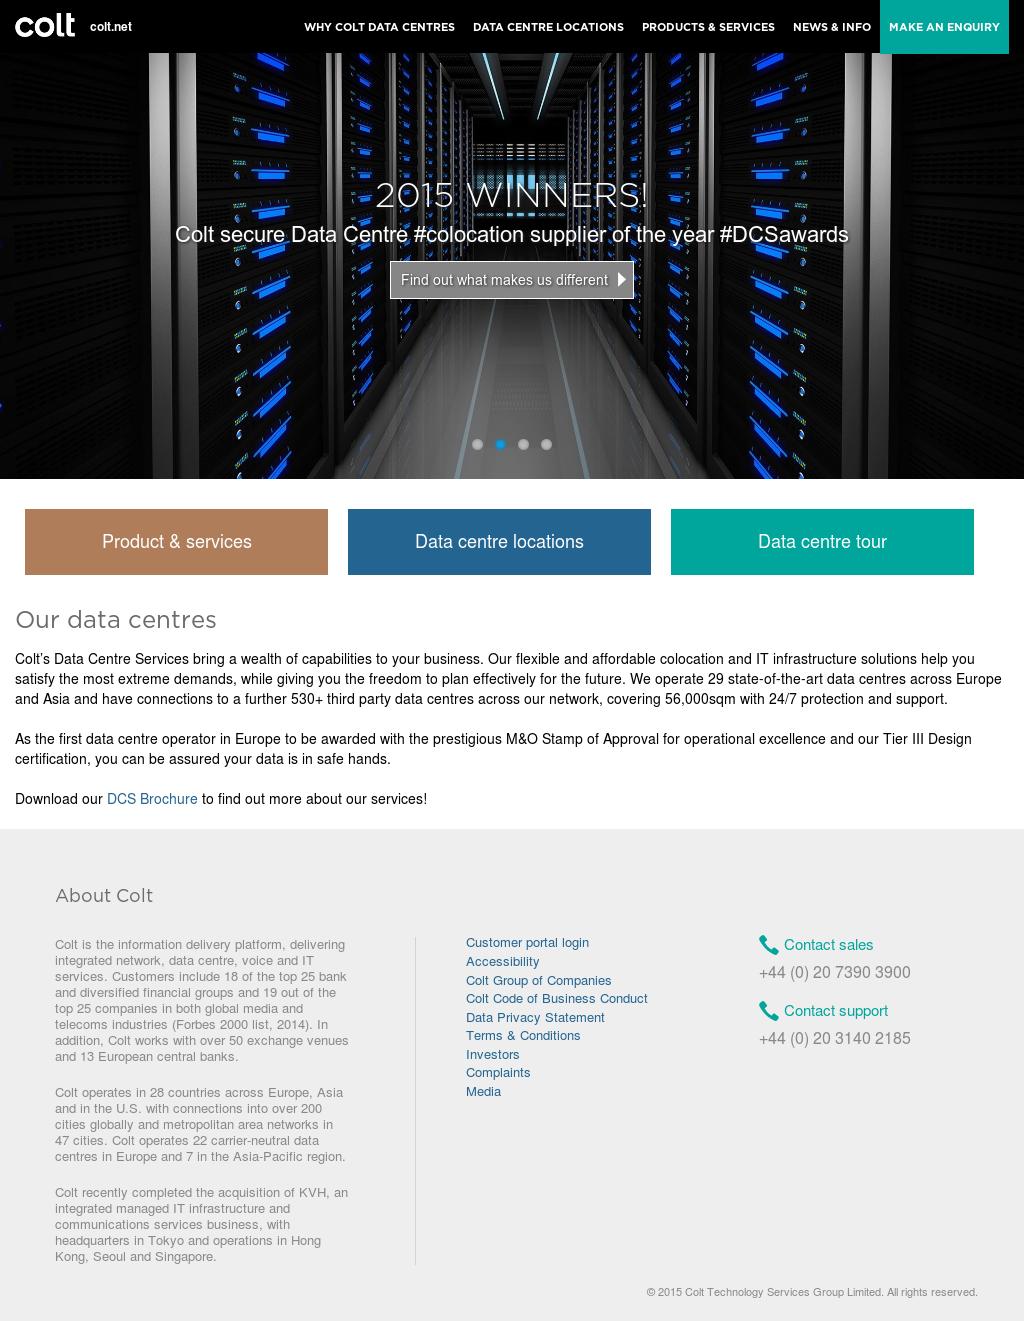 Colt Data Centre Services Competitors, Revenue and Employees